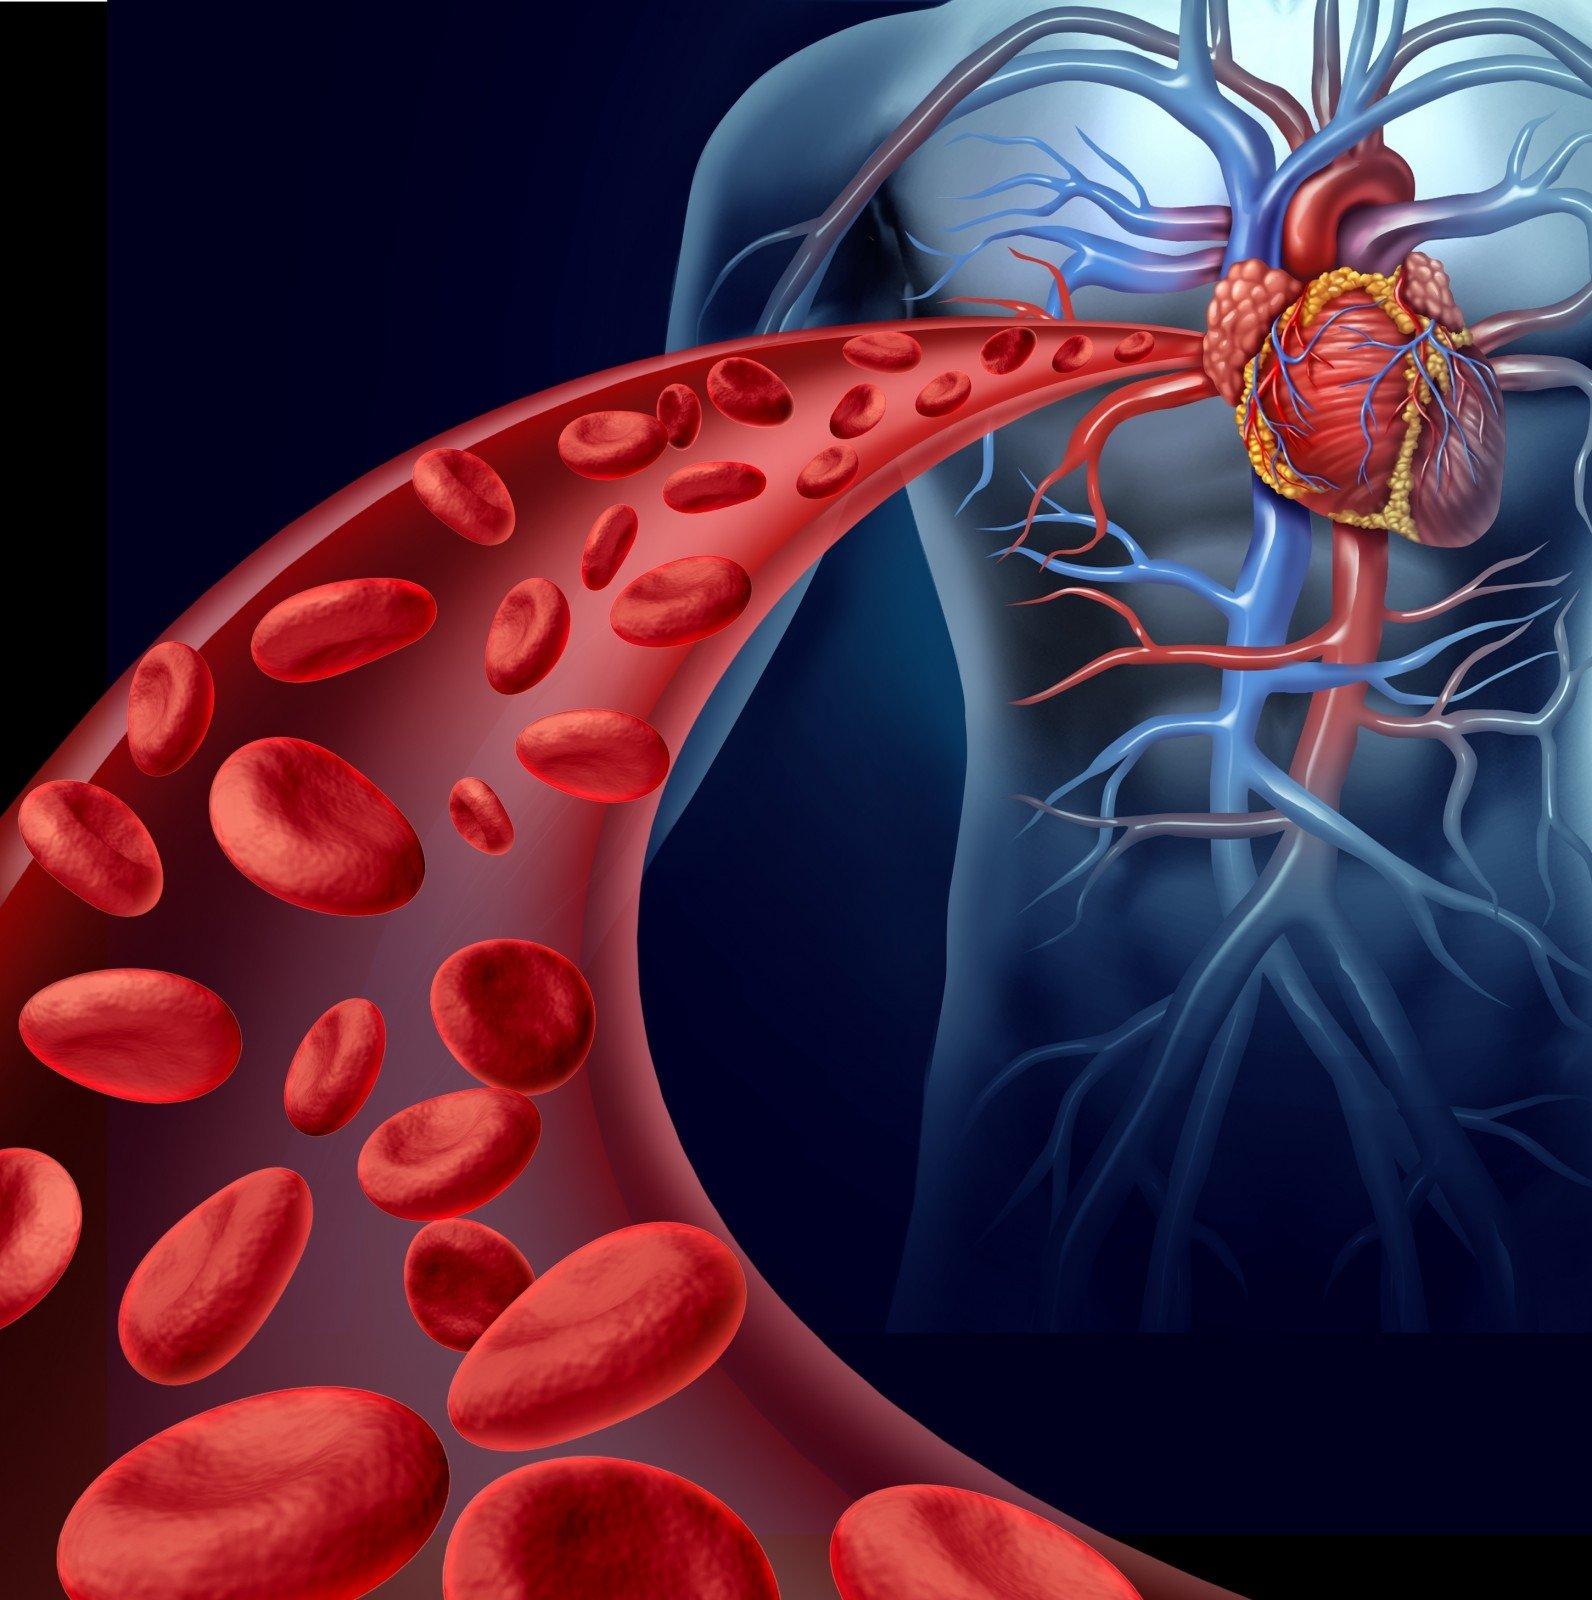 ką galite gerti sergant hipertenzija